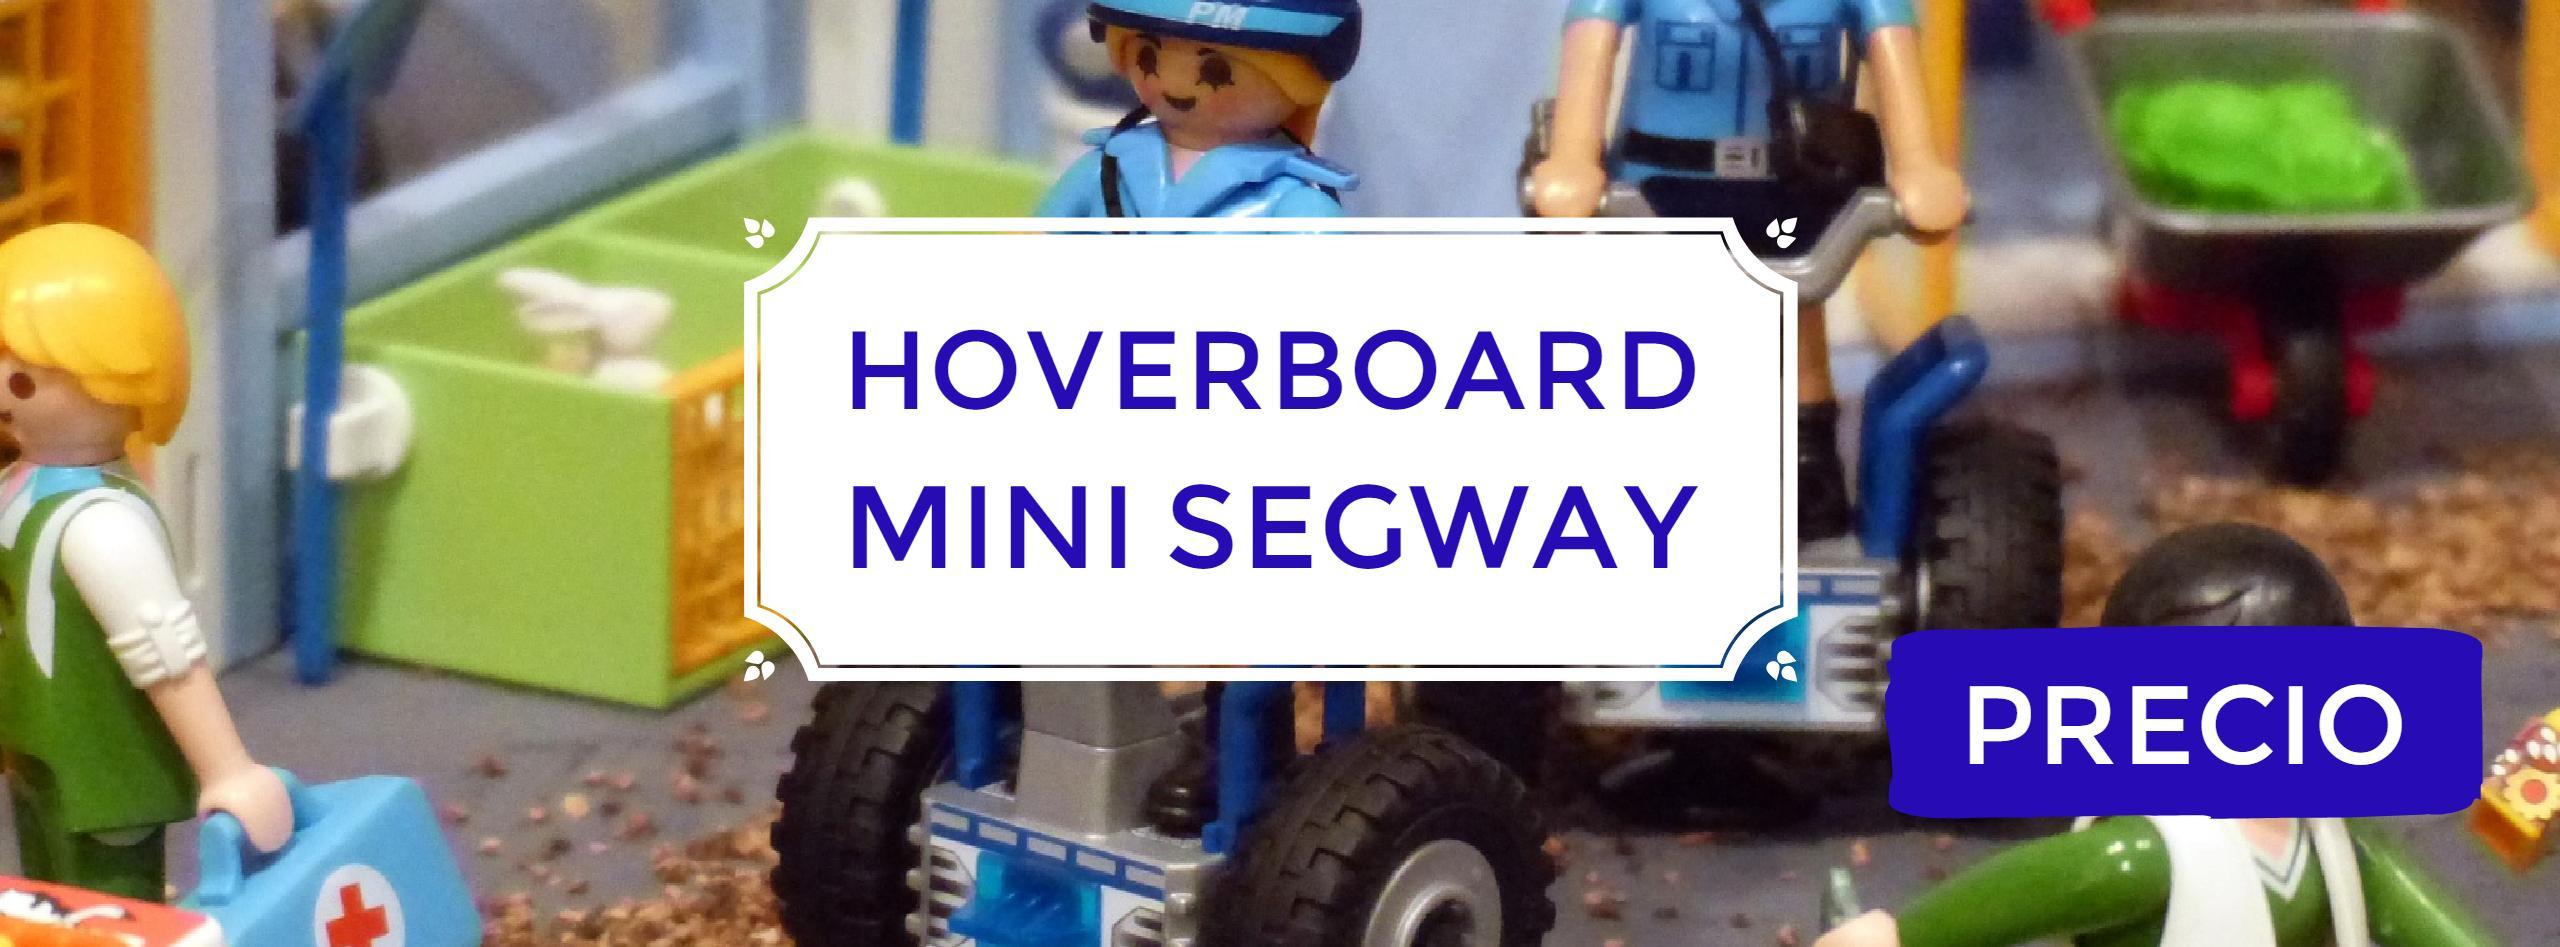 - Hoverboard mini Segway